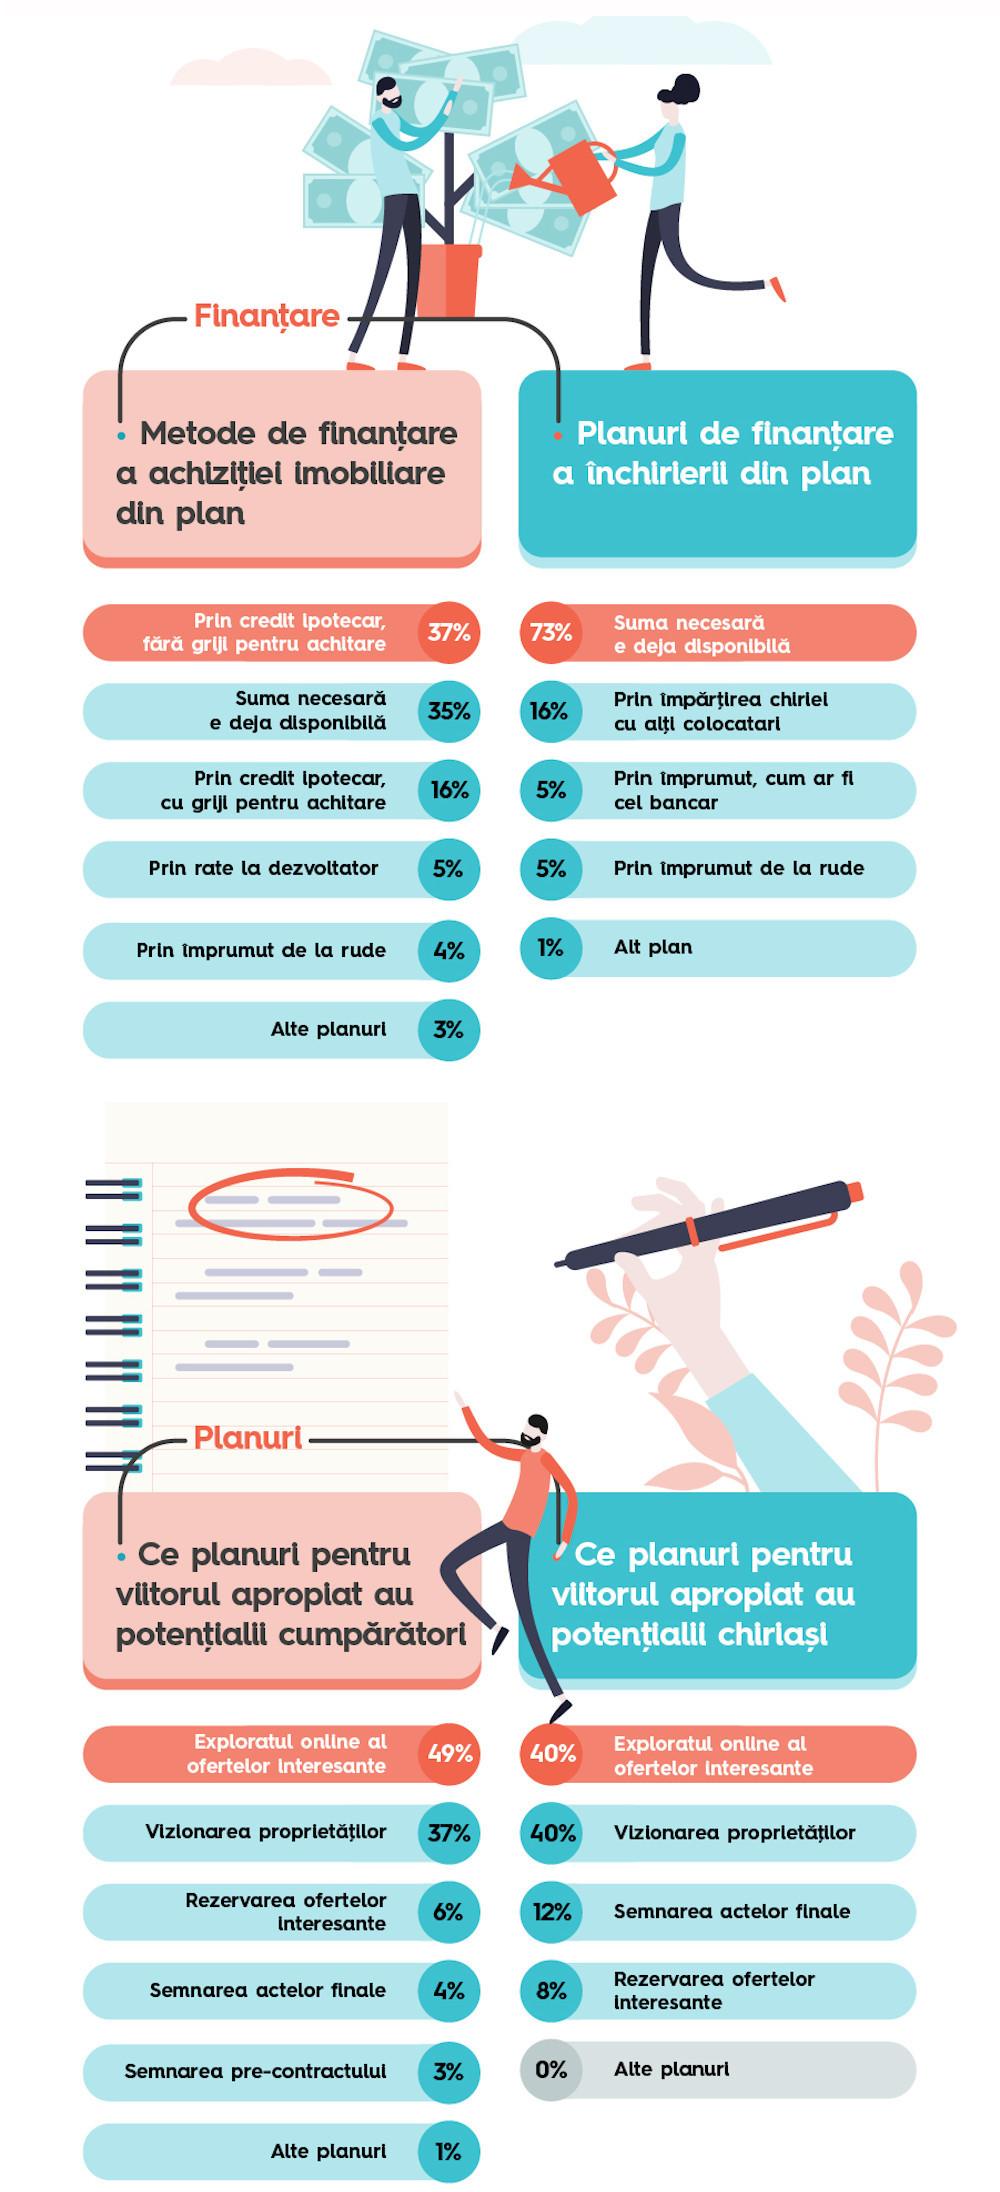 Storia.ro_Infografic 1-4